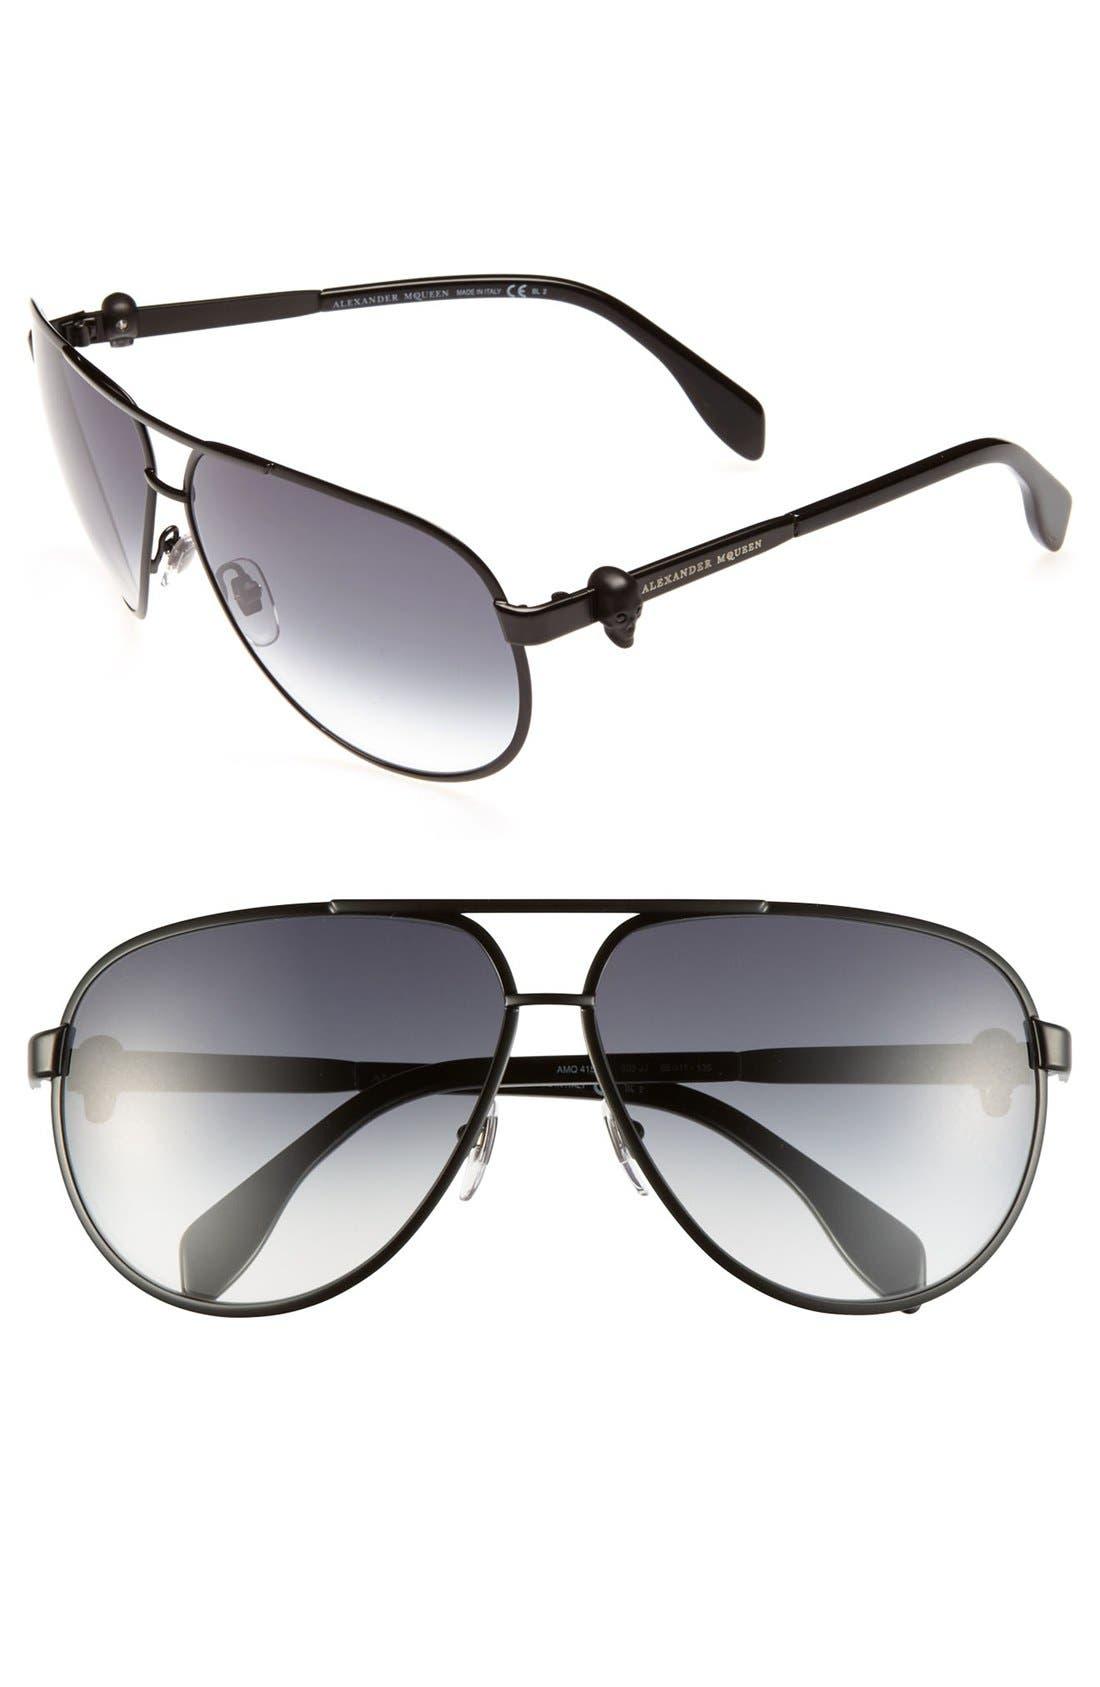 65mm Skull Temple Metal Aviator Sunglasses,                         Main,                         color, 001